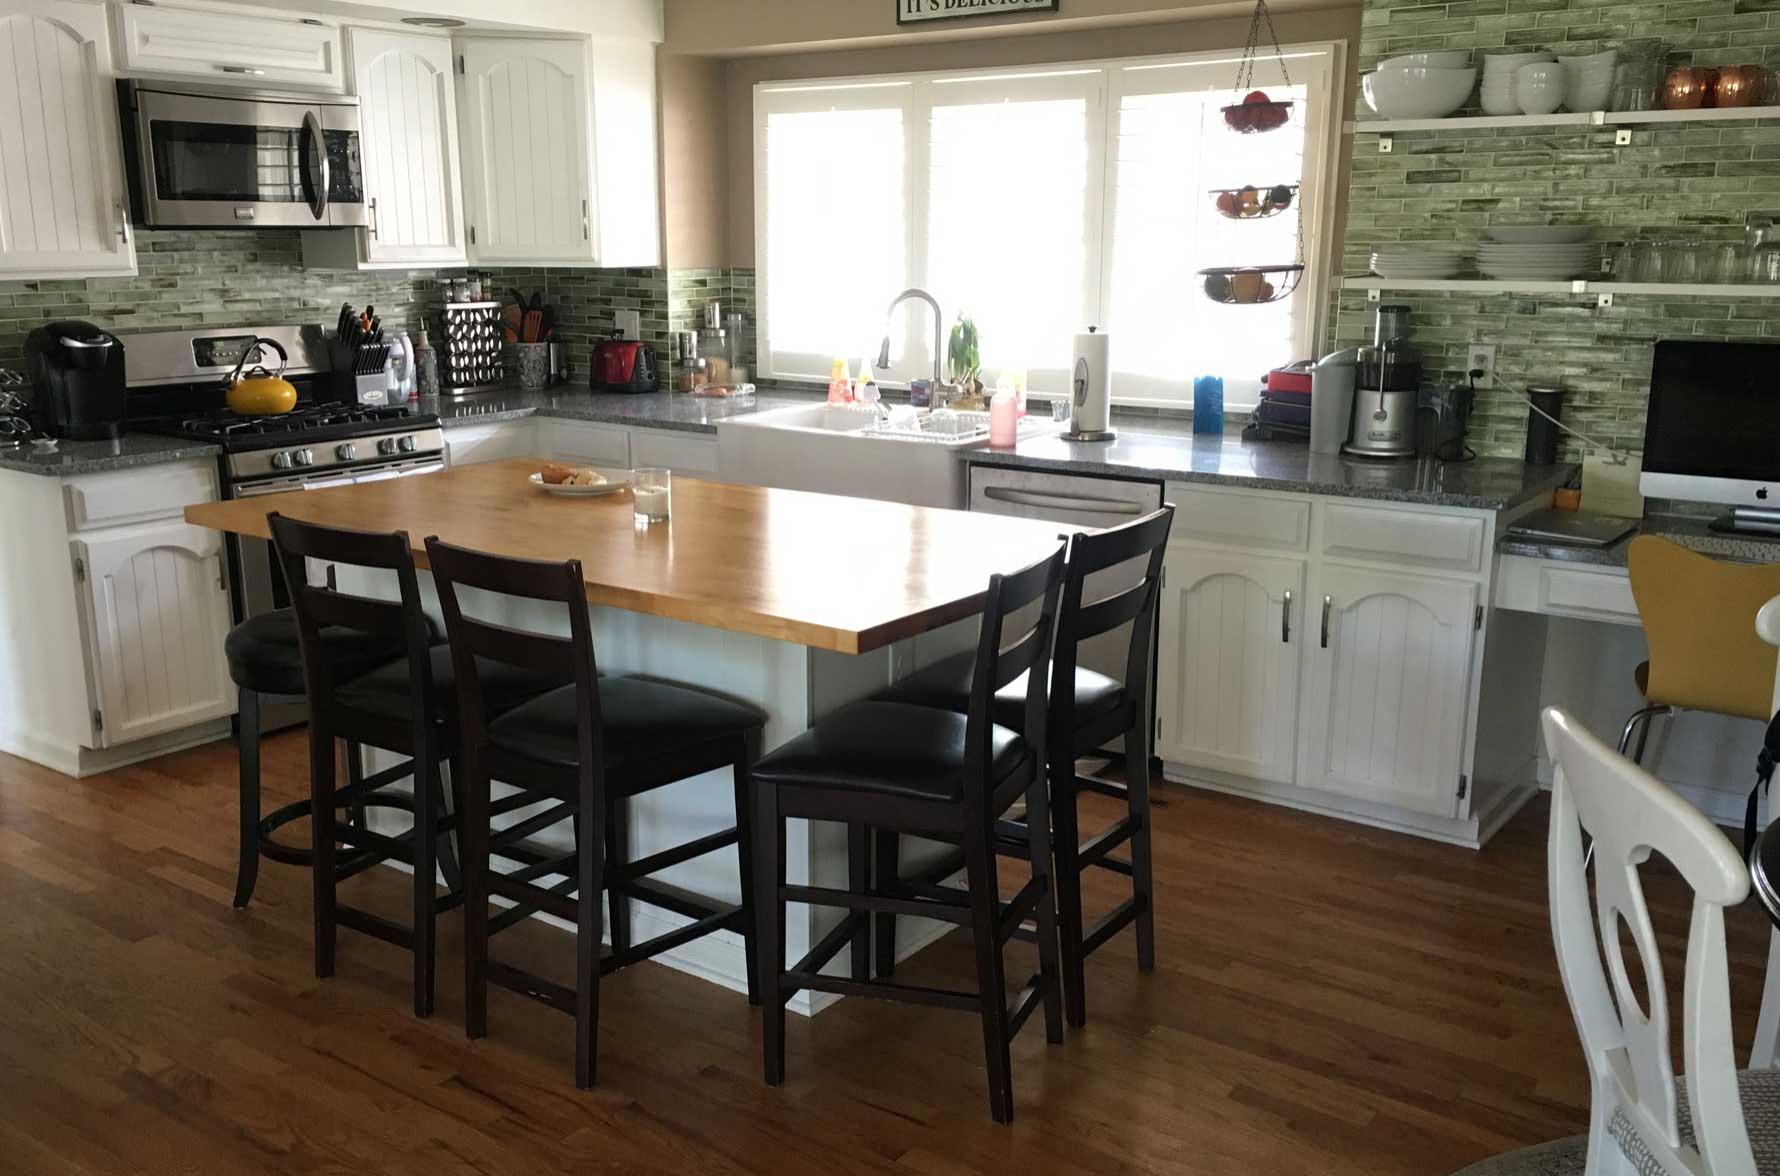 Colorado Kitchen Island-Before!